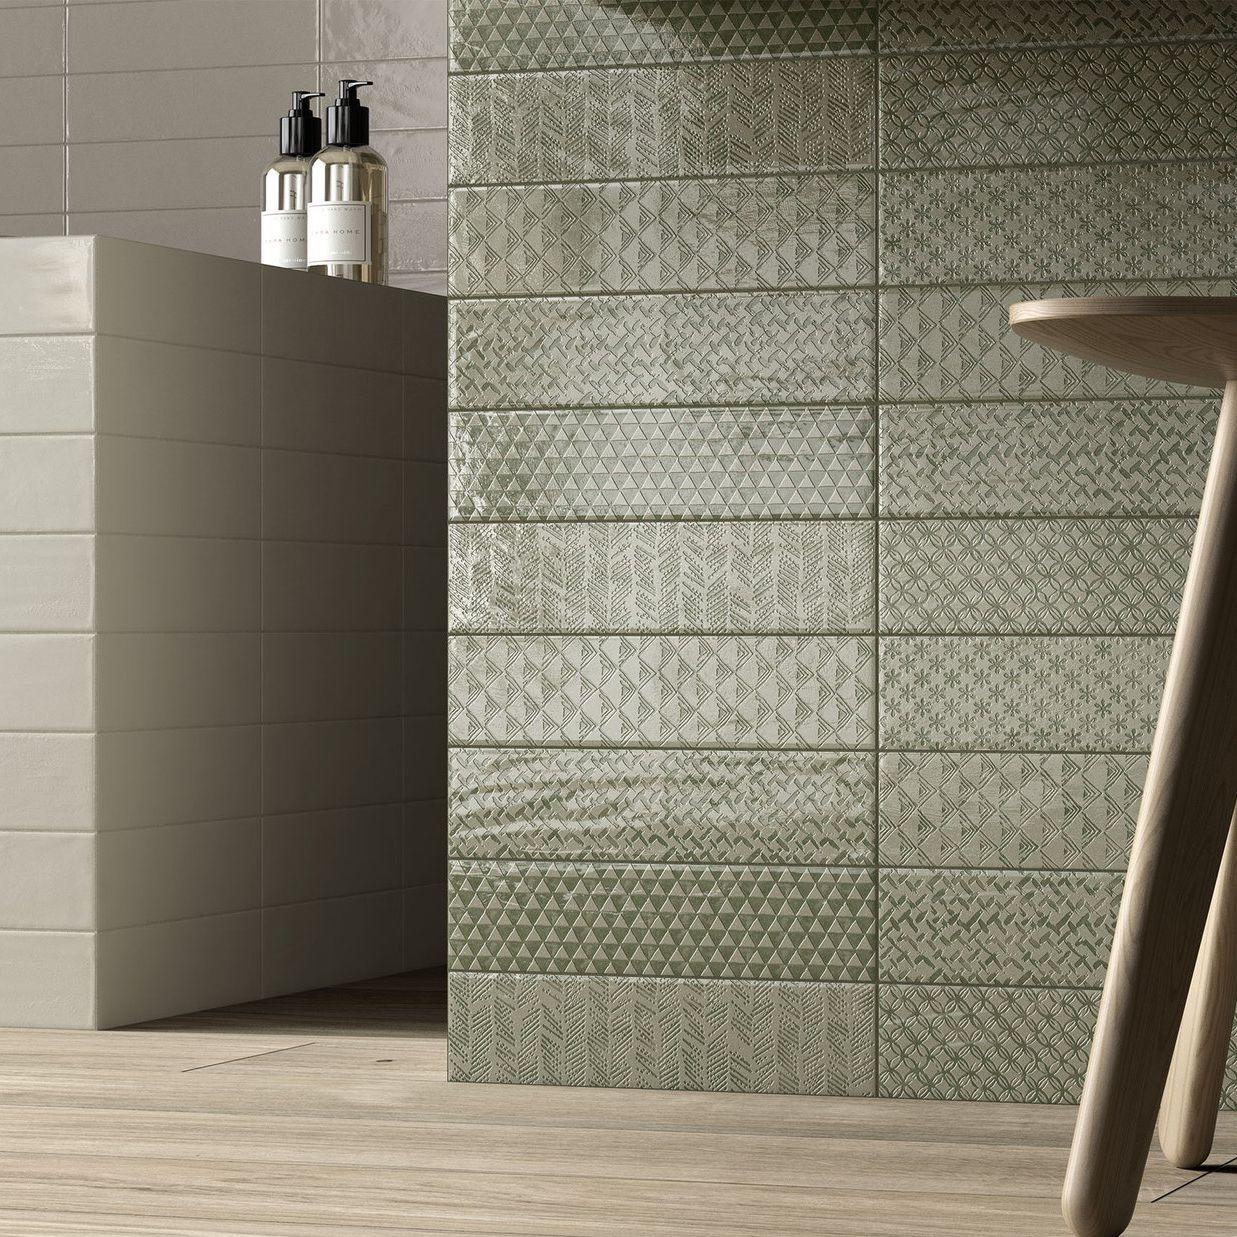 Bathroom tile / kitchen / wall / porcelain stoneware - LOFT BRICK ...